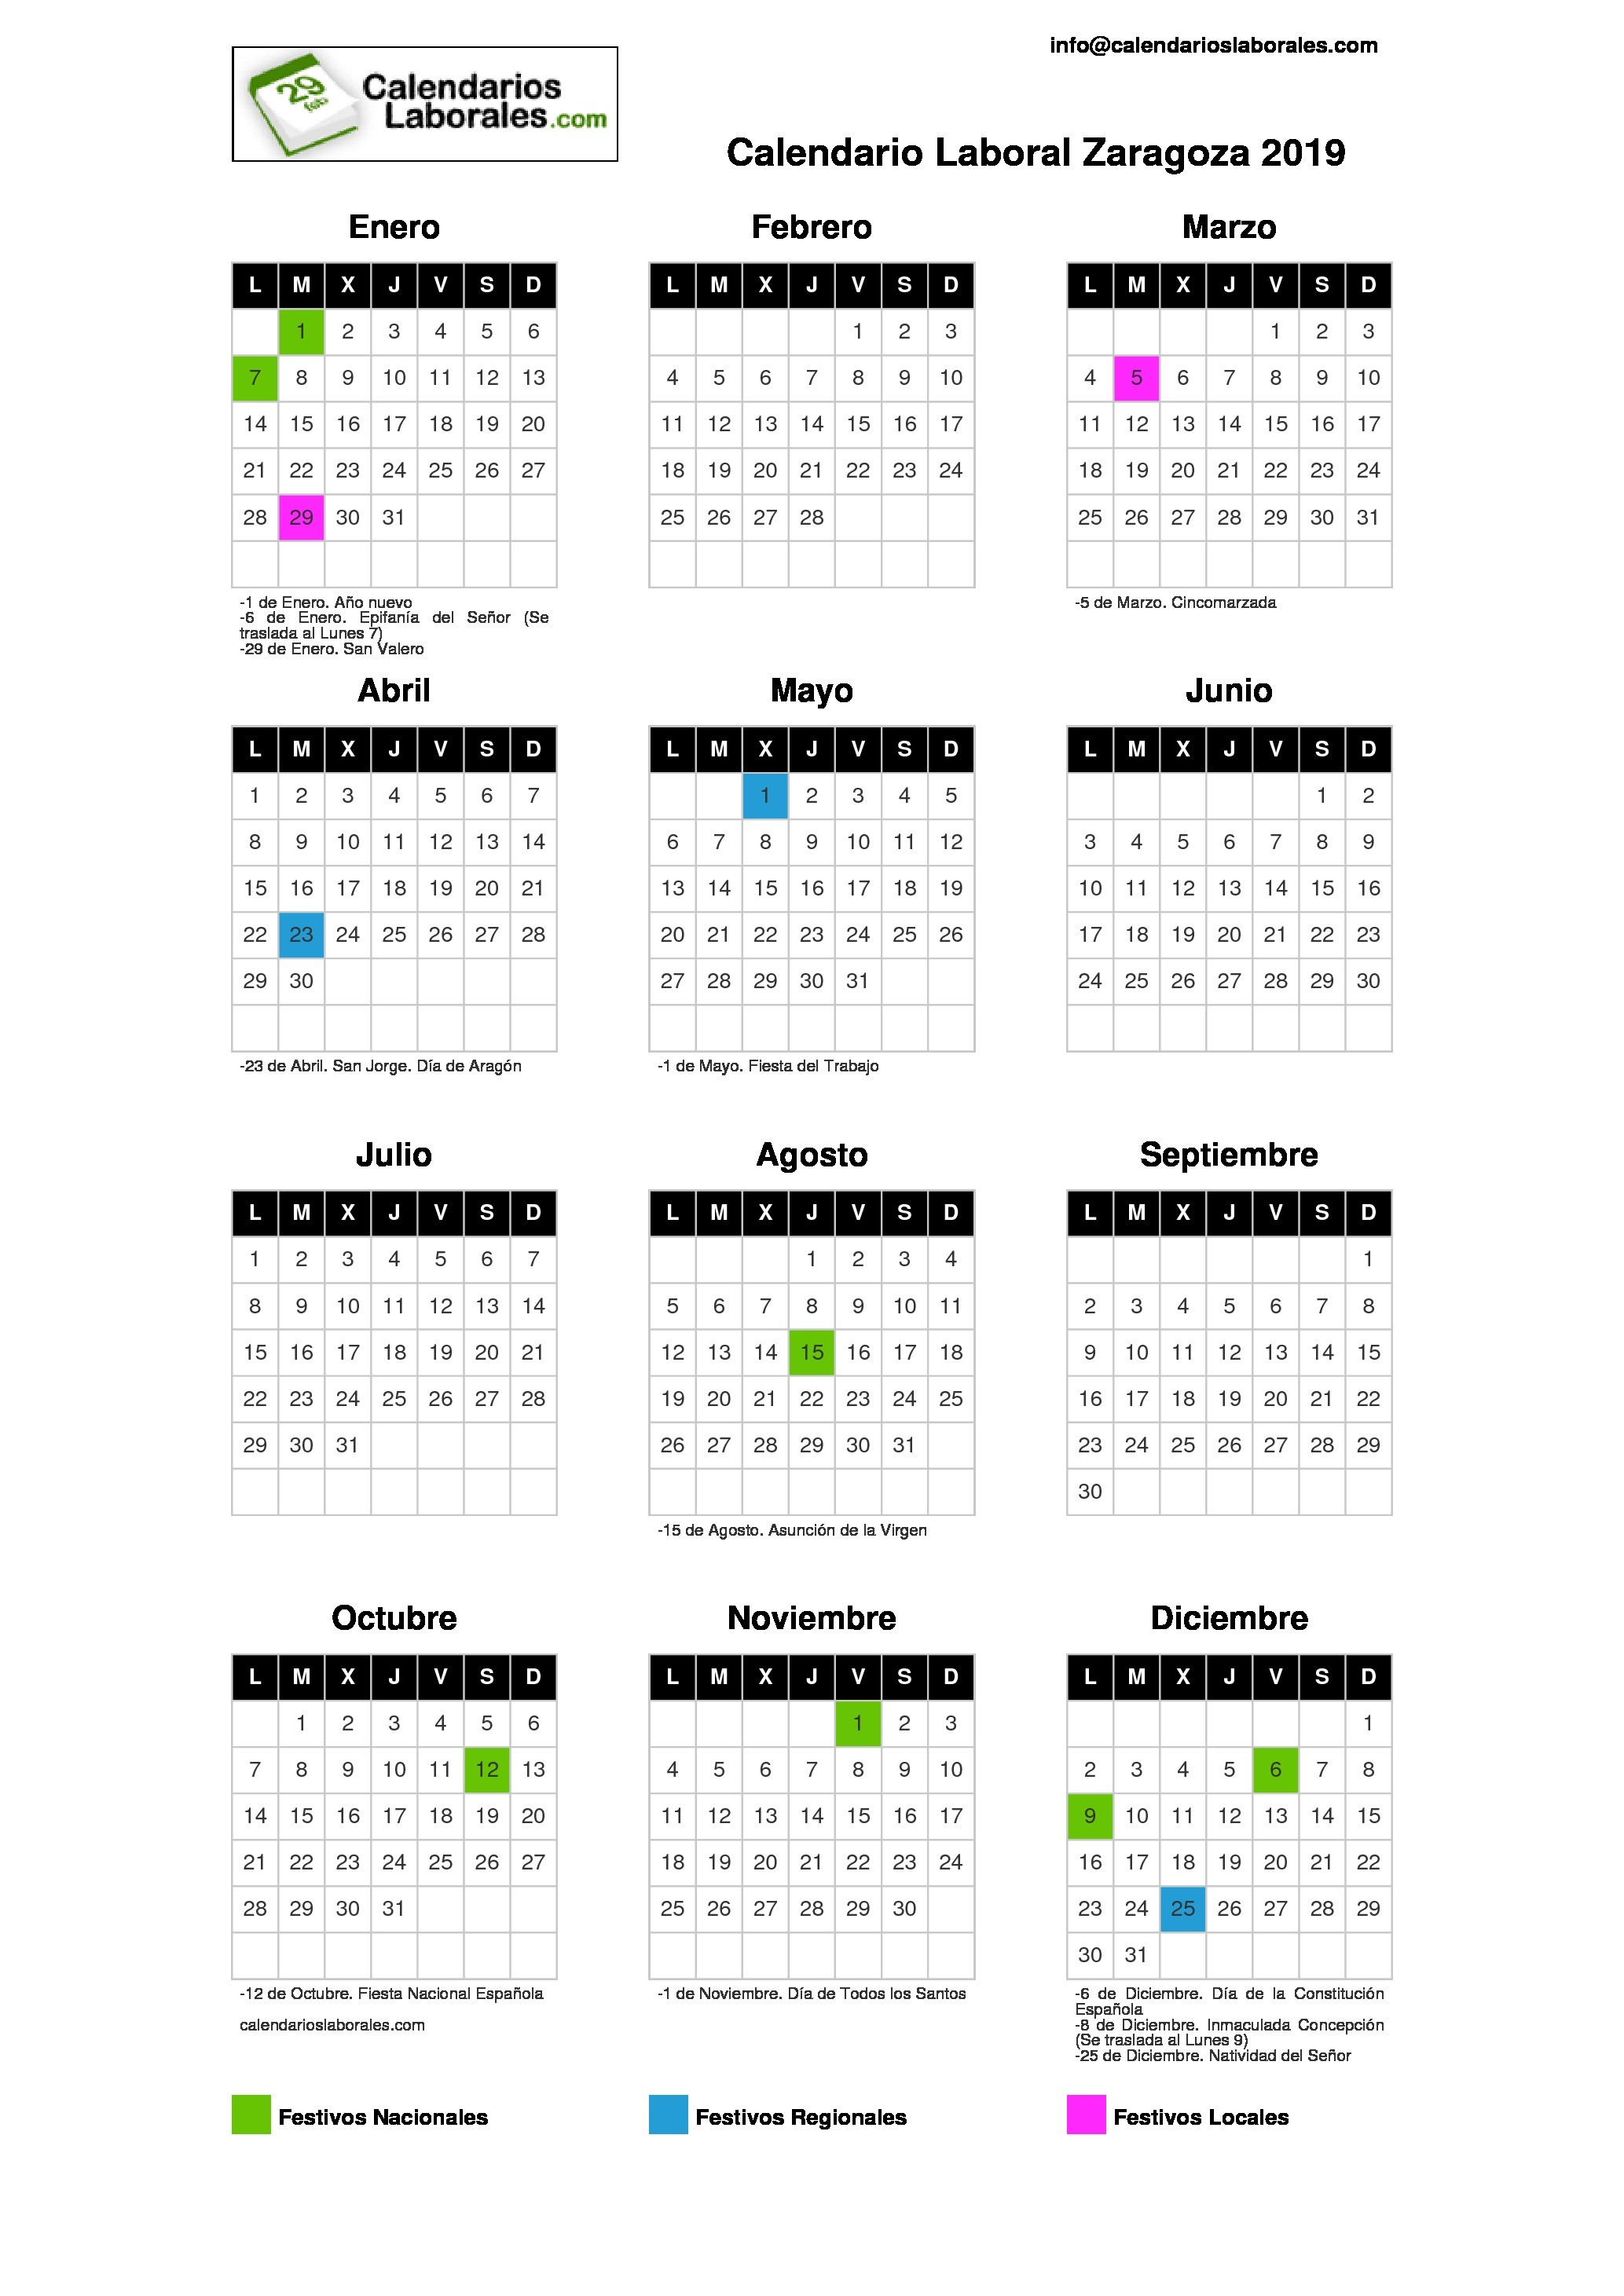 Calendario Laboral En Aragon 2019 Actual Calendario Laboral Zaragoza 2019 Of Calendario Laboral En Aragon 2019 Más Reciente El Calendario Laboral De 2019 – Sala Cola – Abogados Y asesores